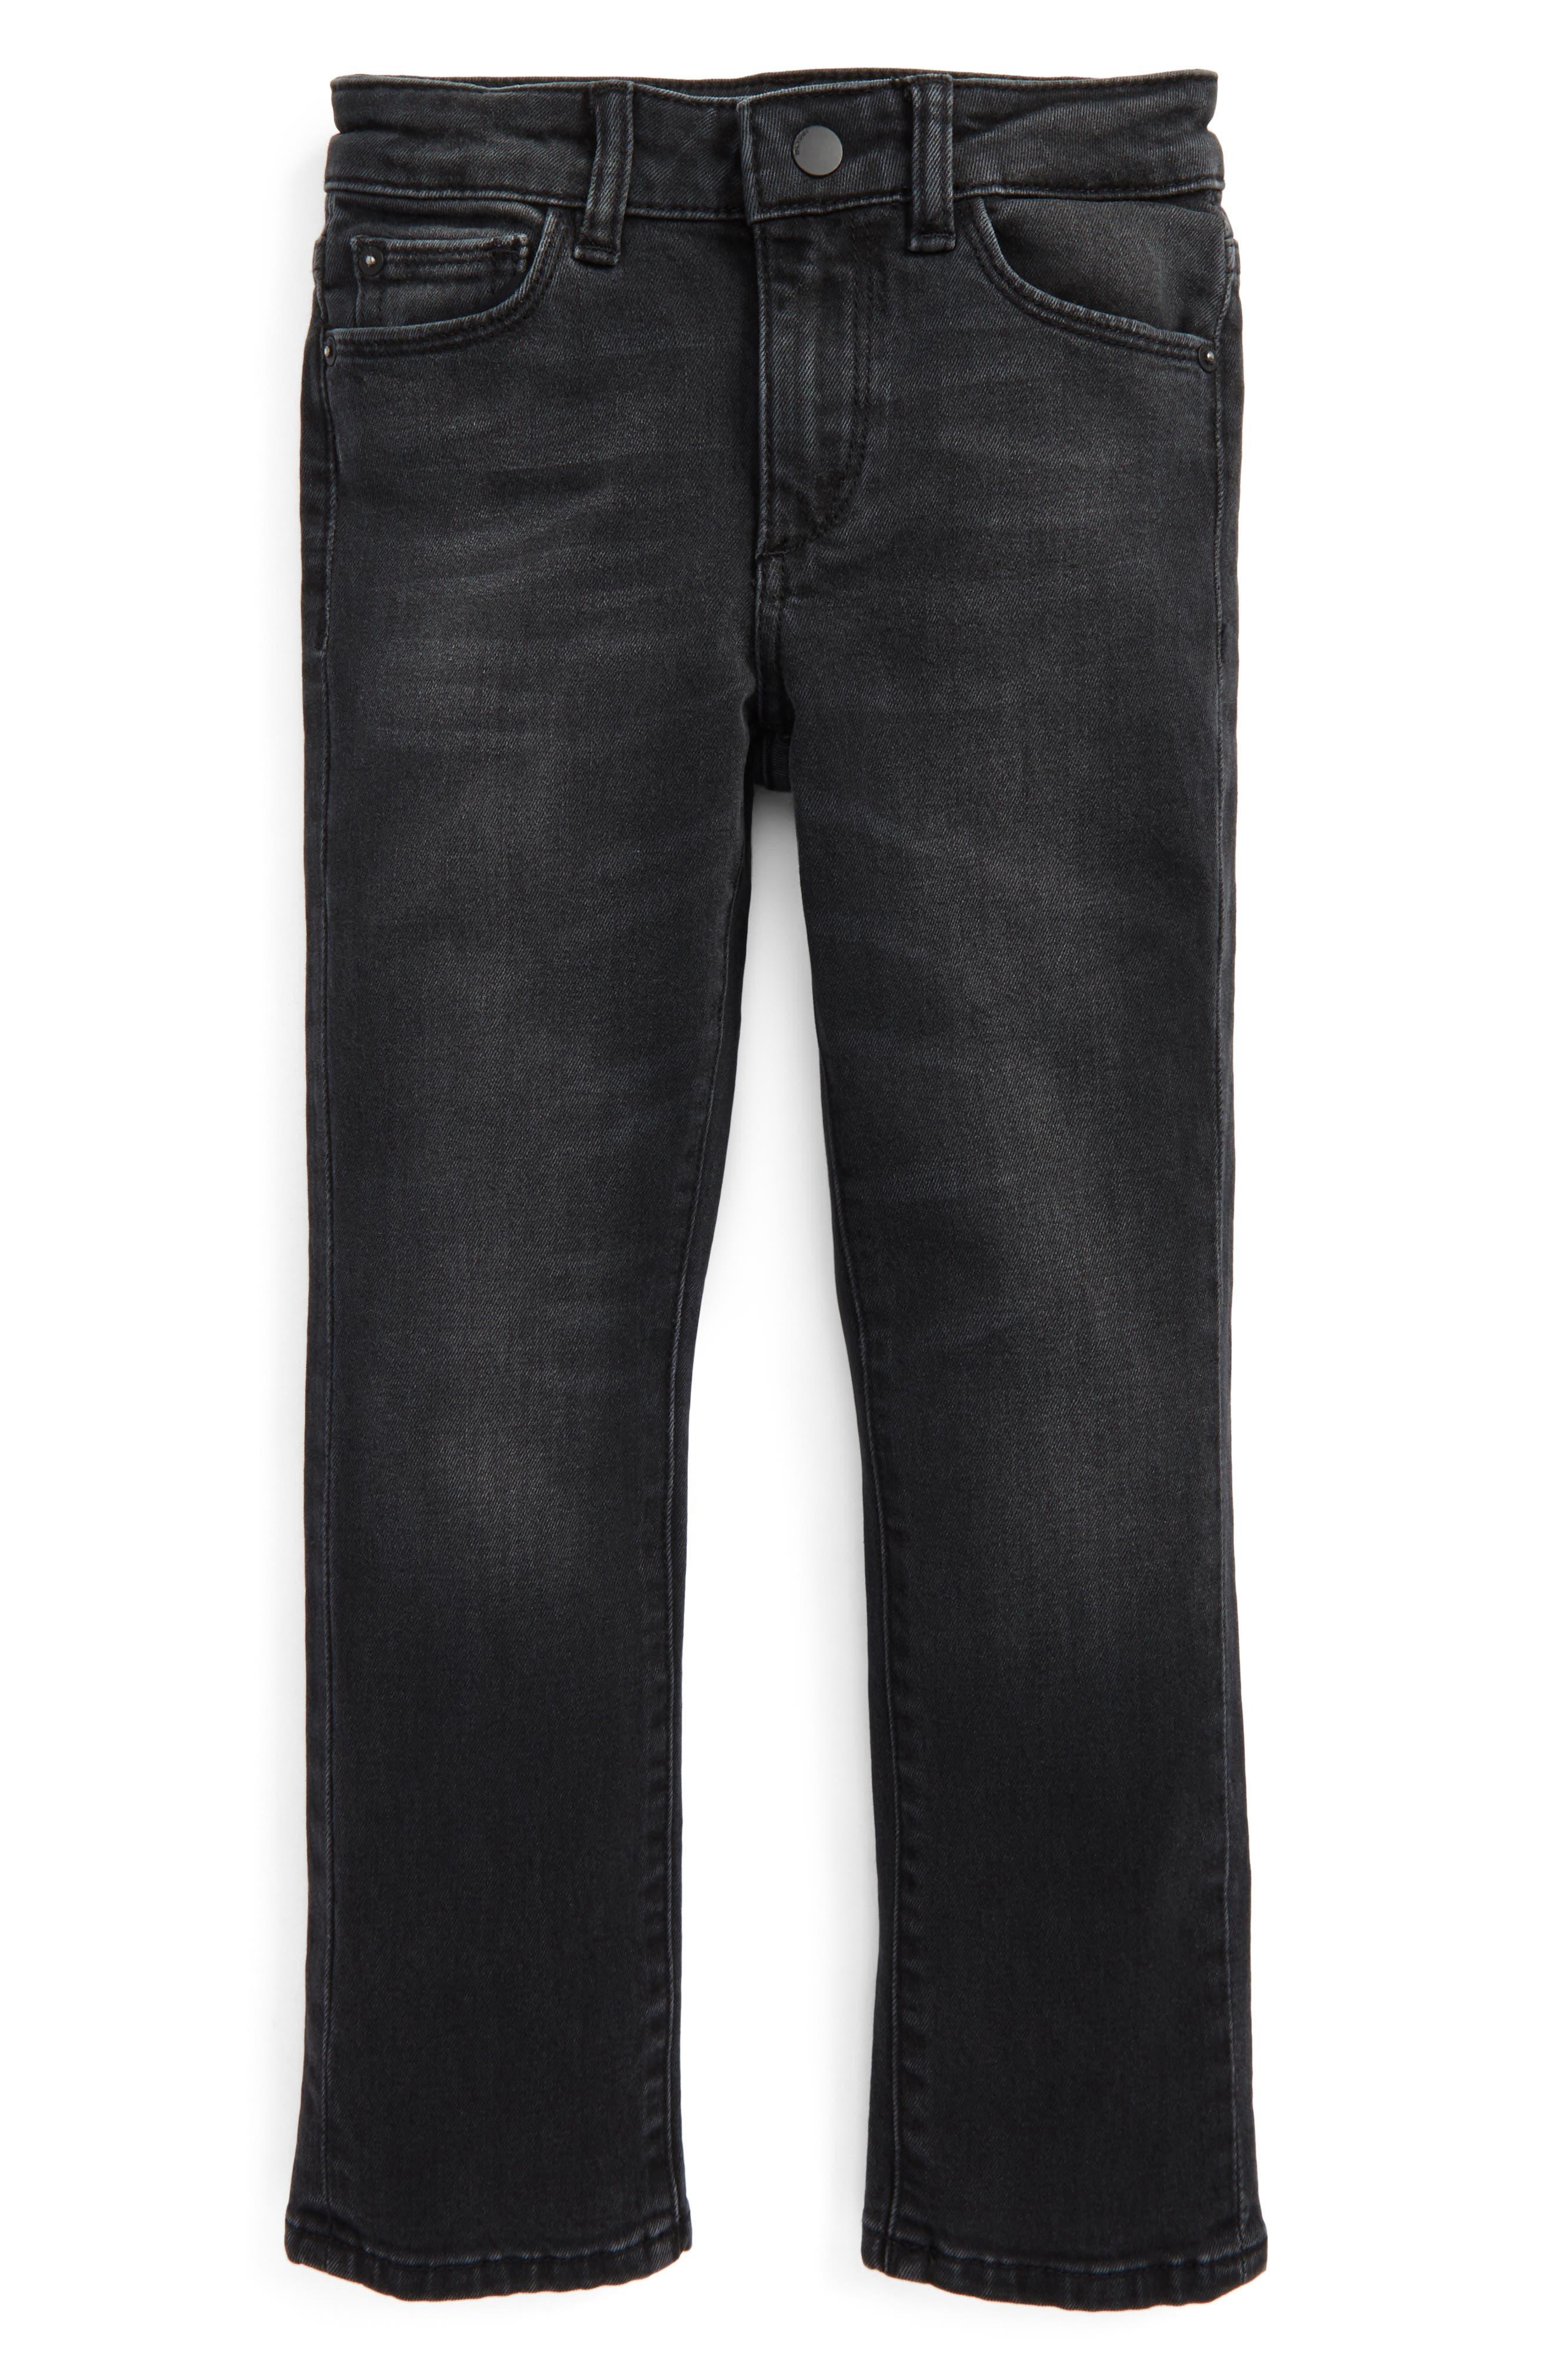 DL 1961 Hawke Skinny Jeans,                         Main,                         color, Heathcliff